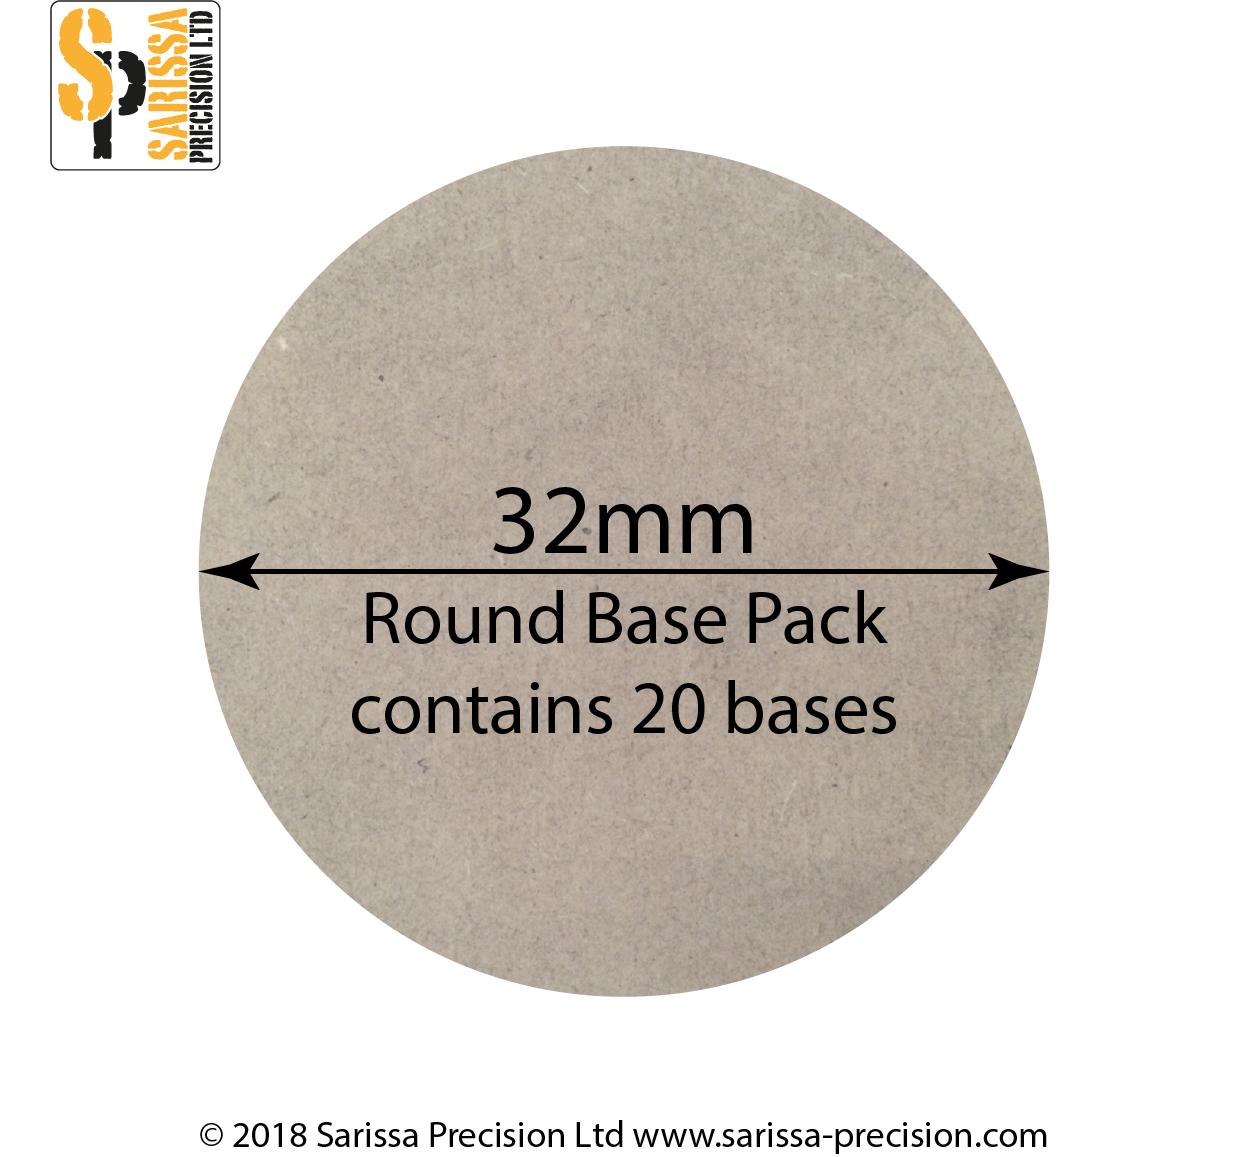 32mm Round Base, Sarissa Precision